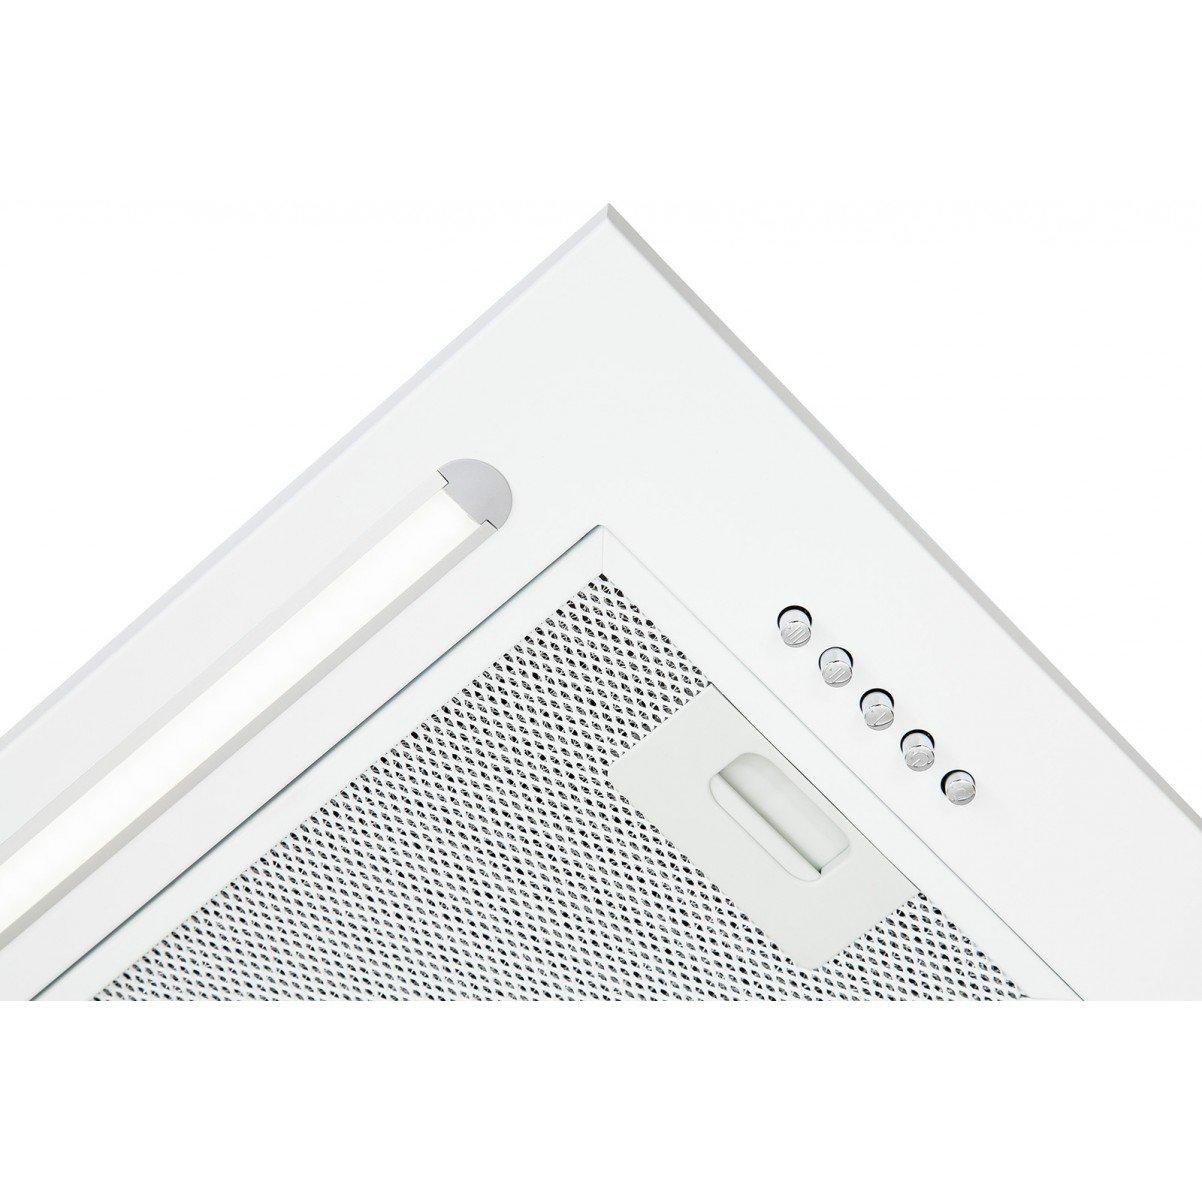 Underbyggnadsfläkt Tovre vit 60 cm/ 90 cm